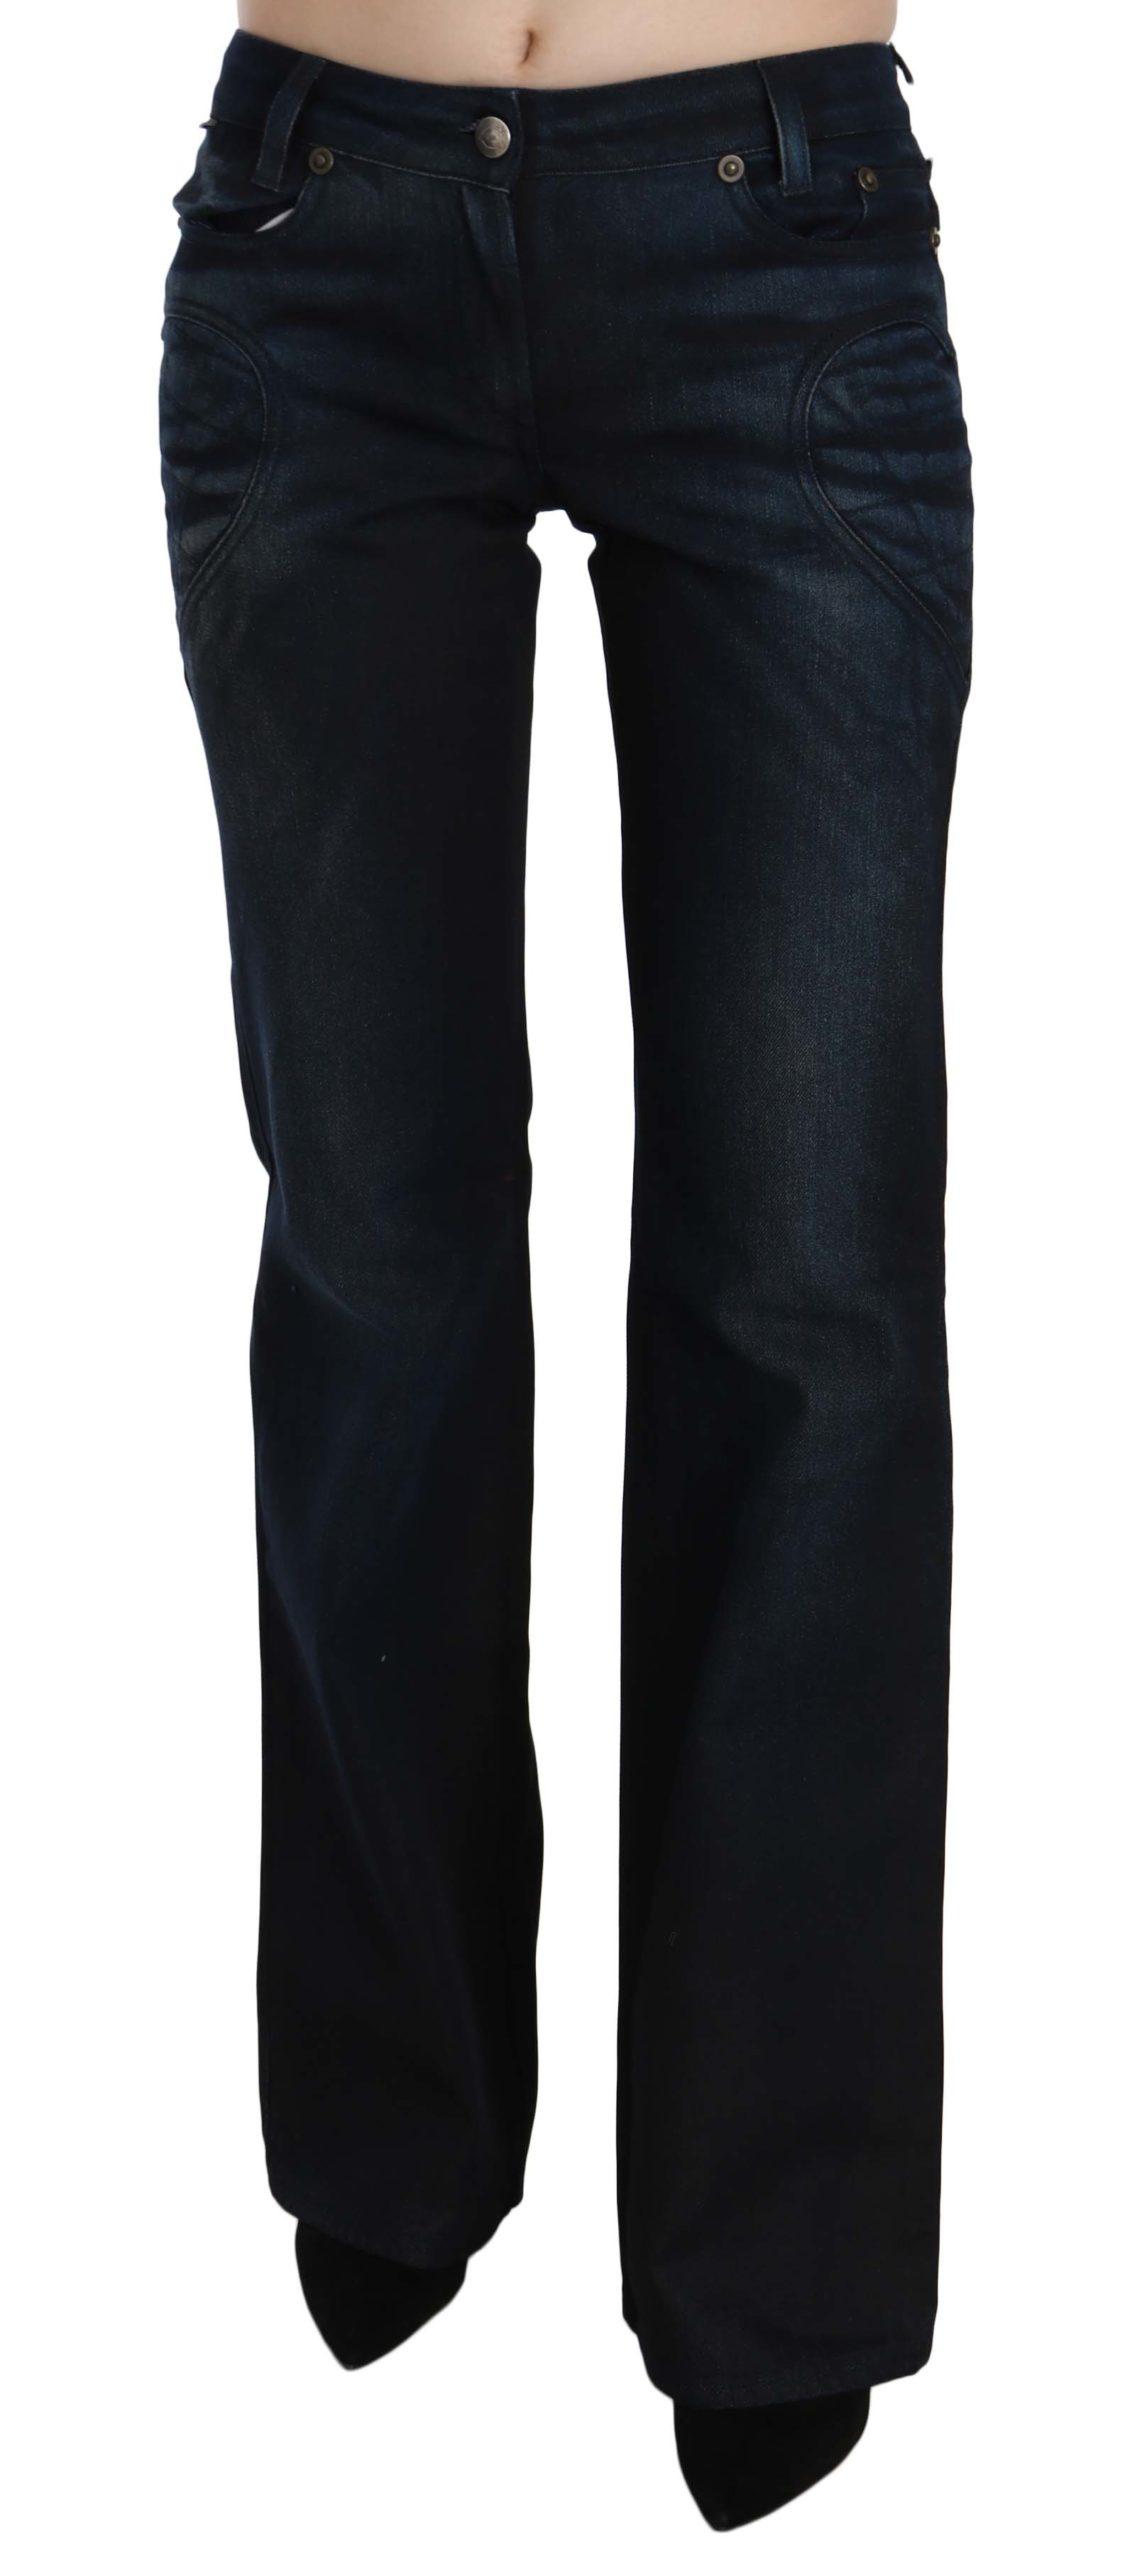 Just Cavalli Women's Mid Waist Straight Denim Trouser Blue PAN70375 - W26